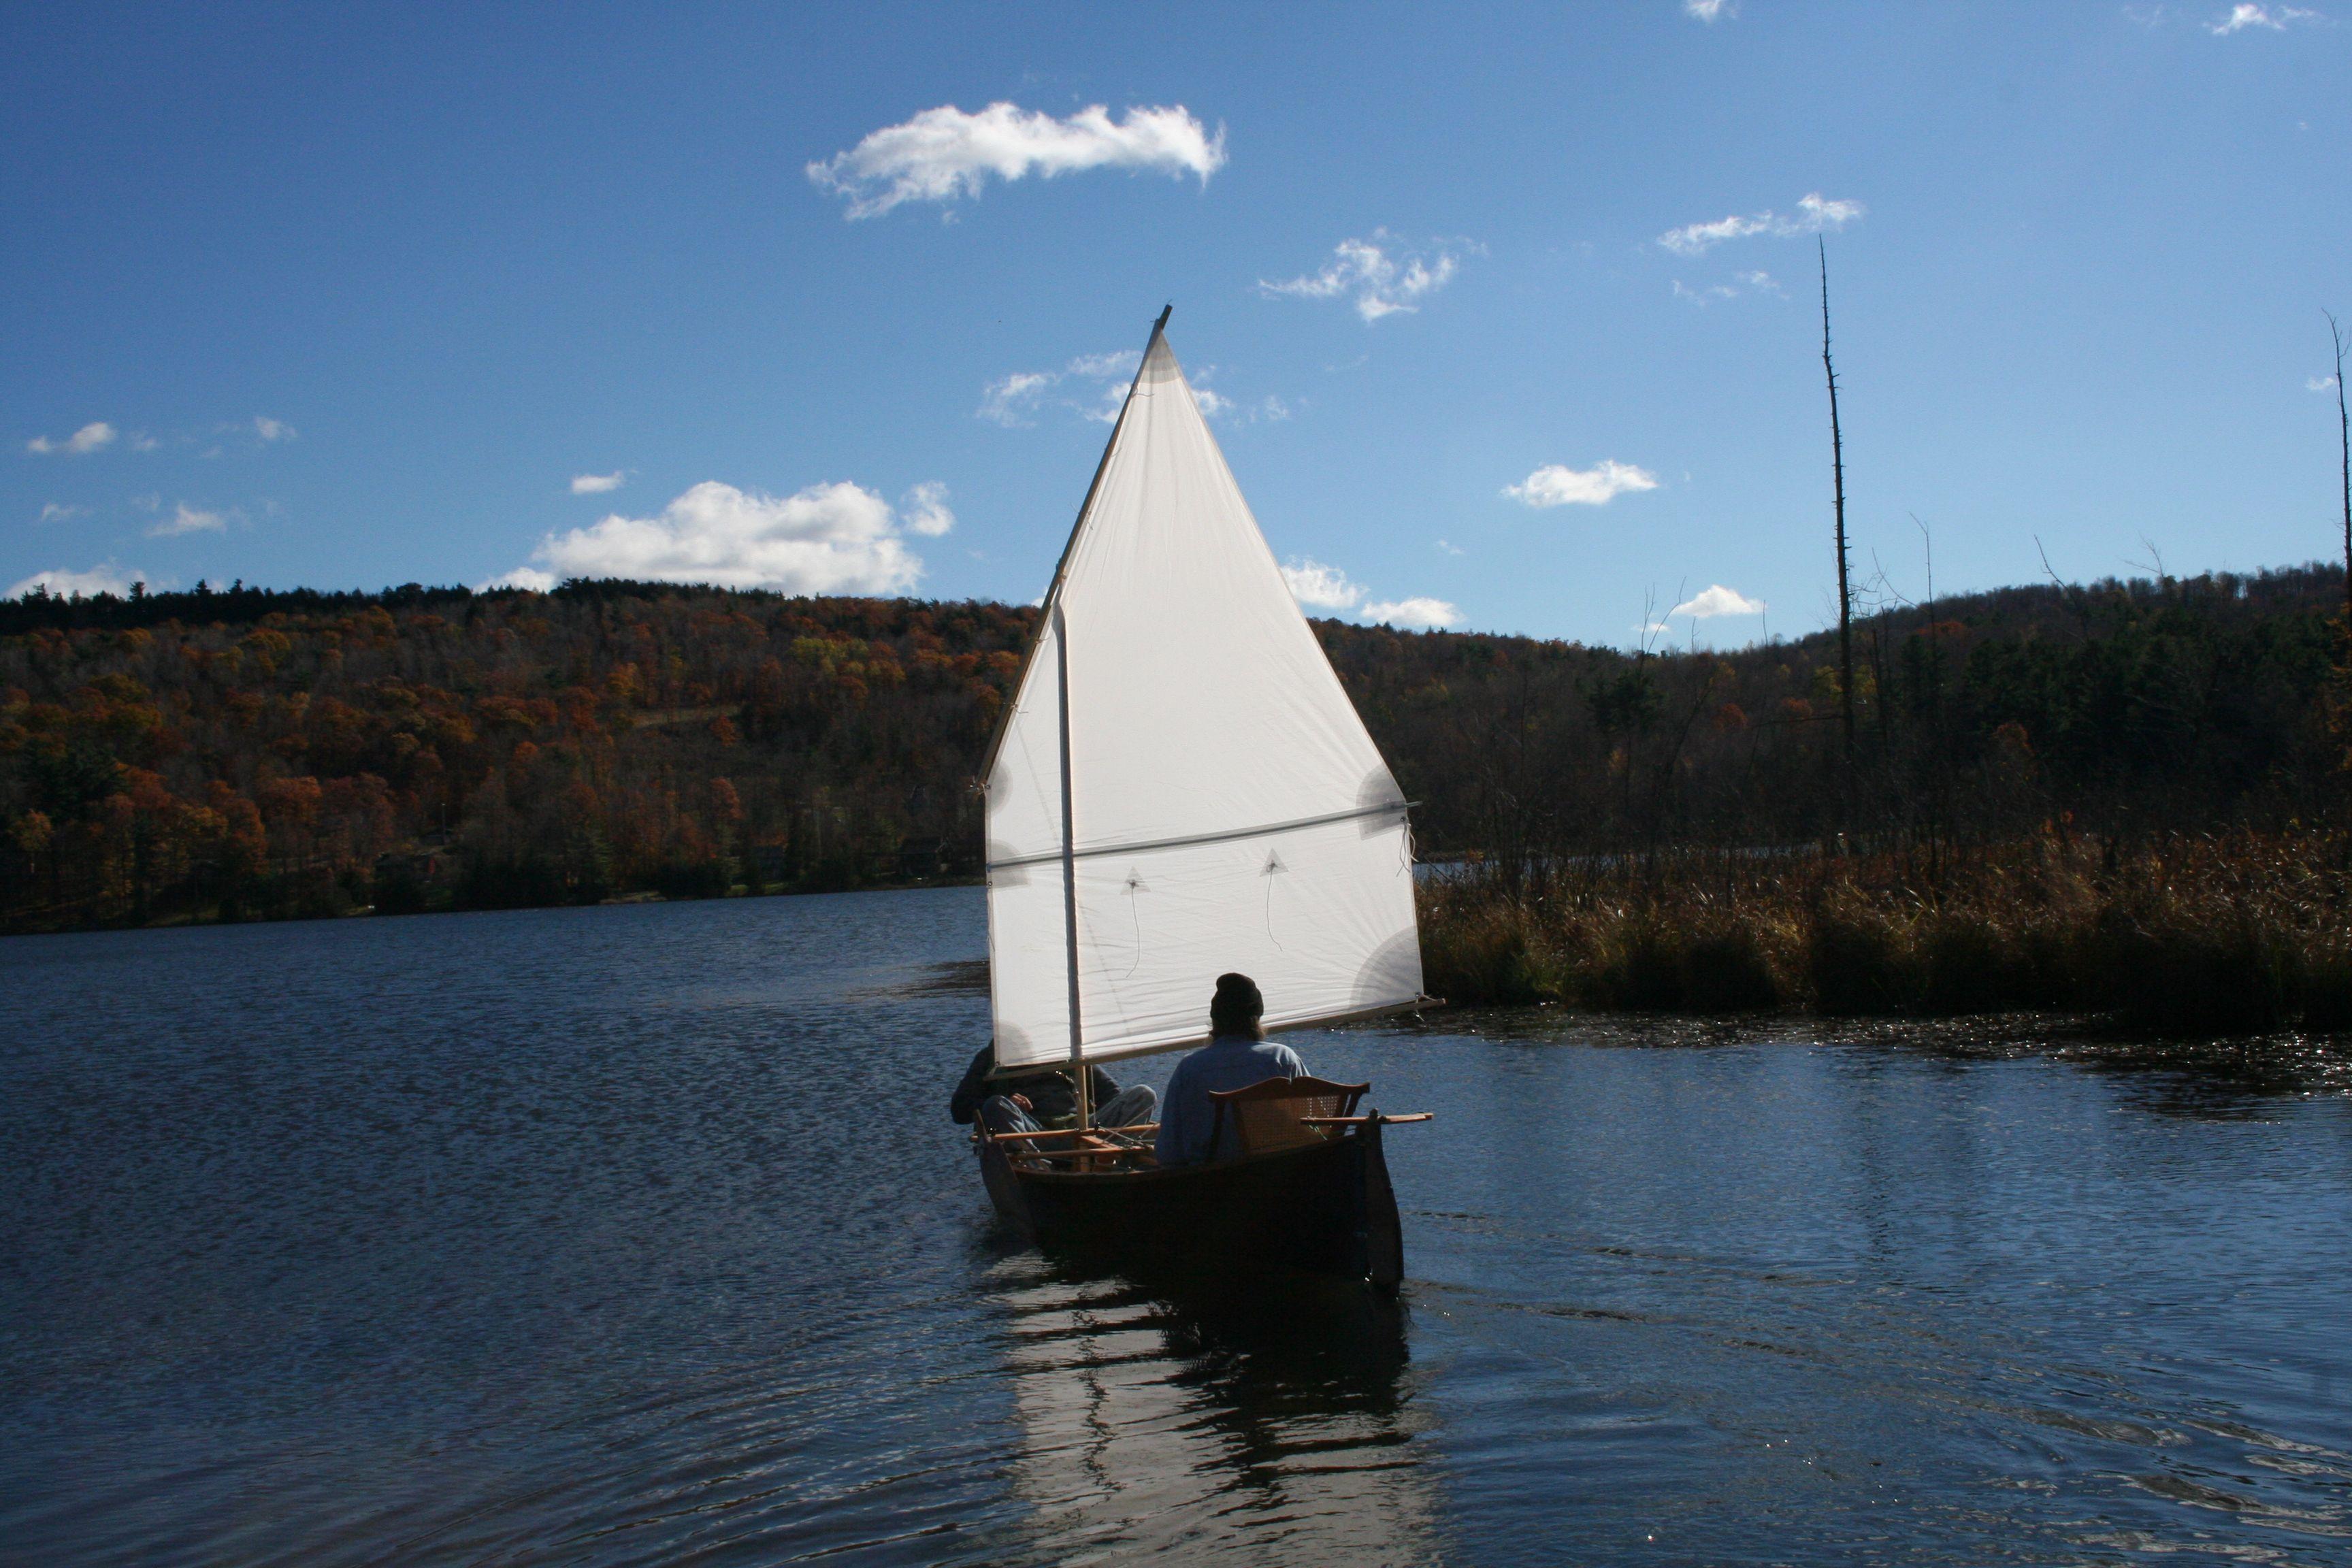 Adirondack Guide Boat Row Boats Packboats Guideboats And Kits Vt Row Boats Boat Boat Kits